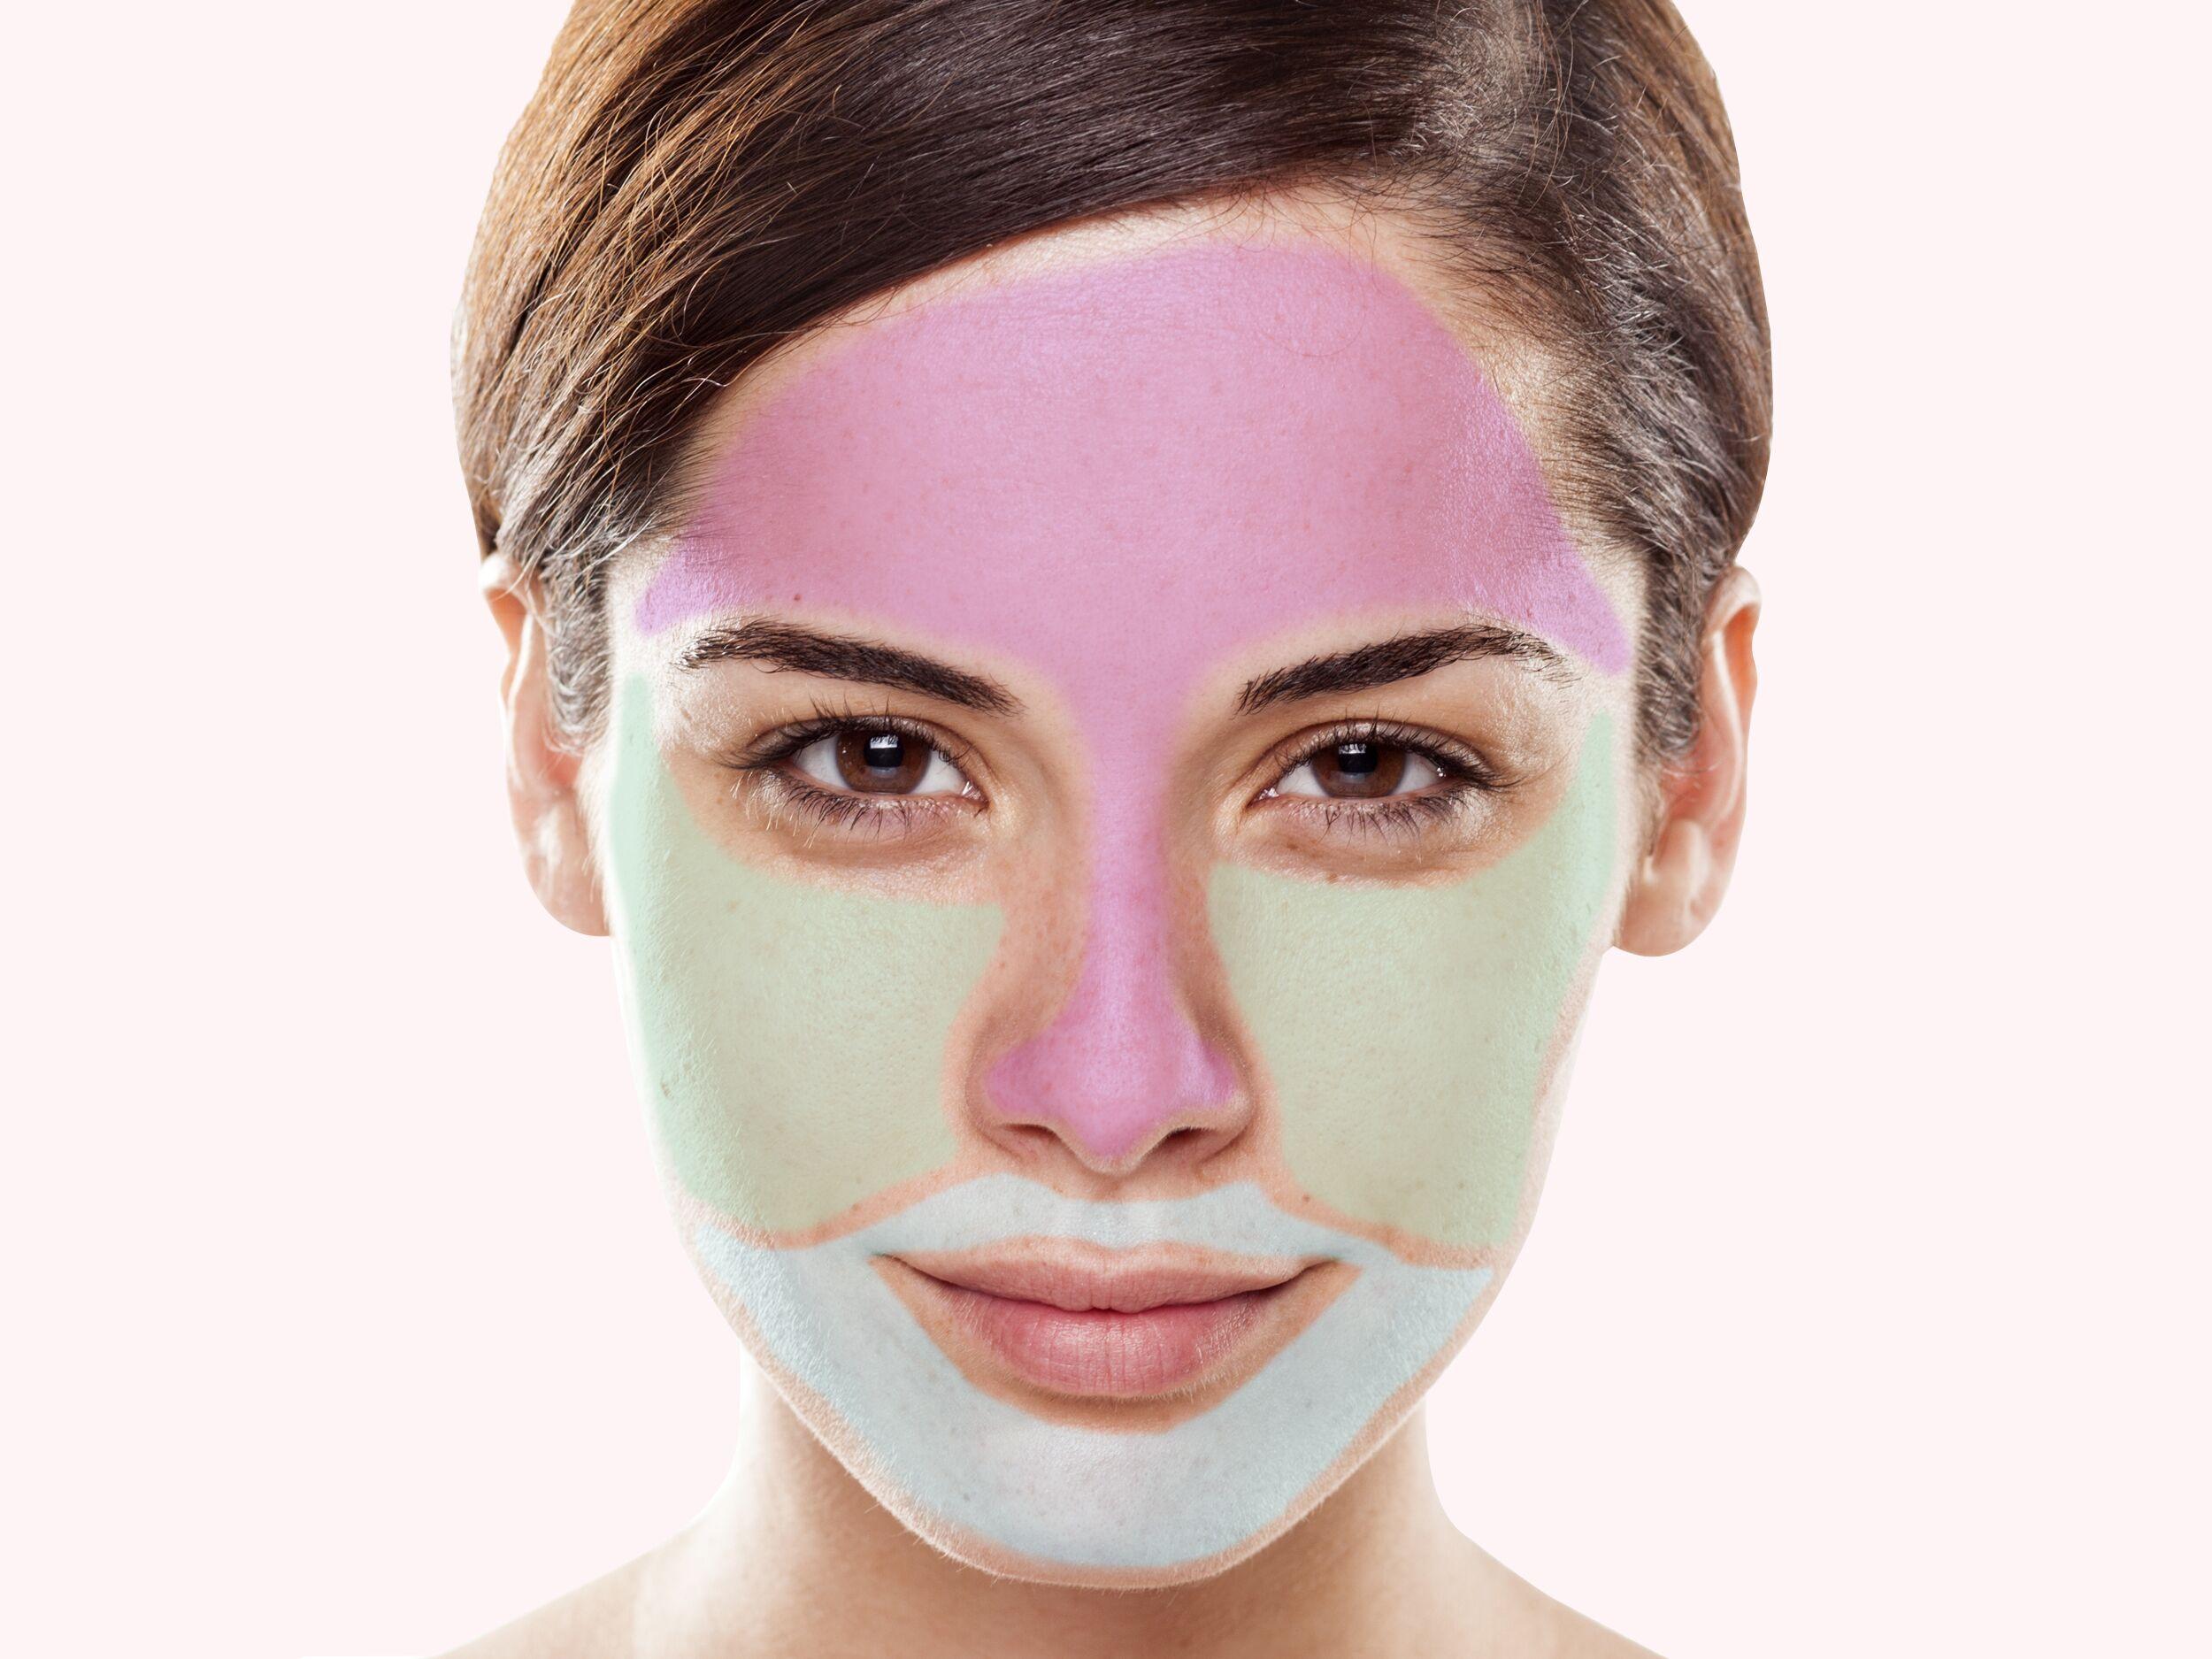 Should I Multi Mask Before My Wedding Day